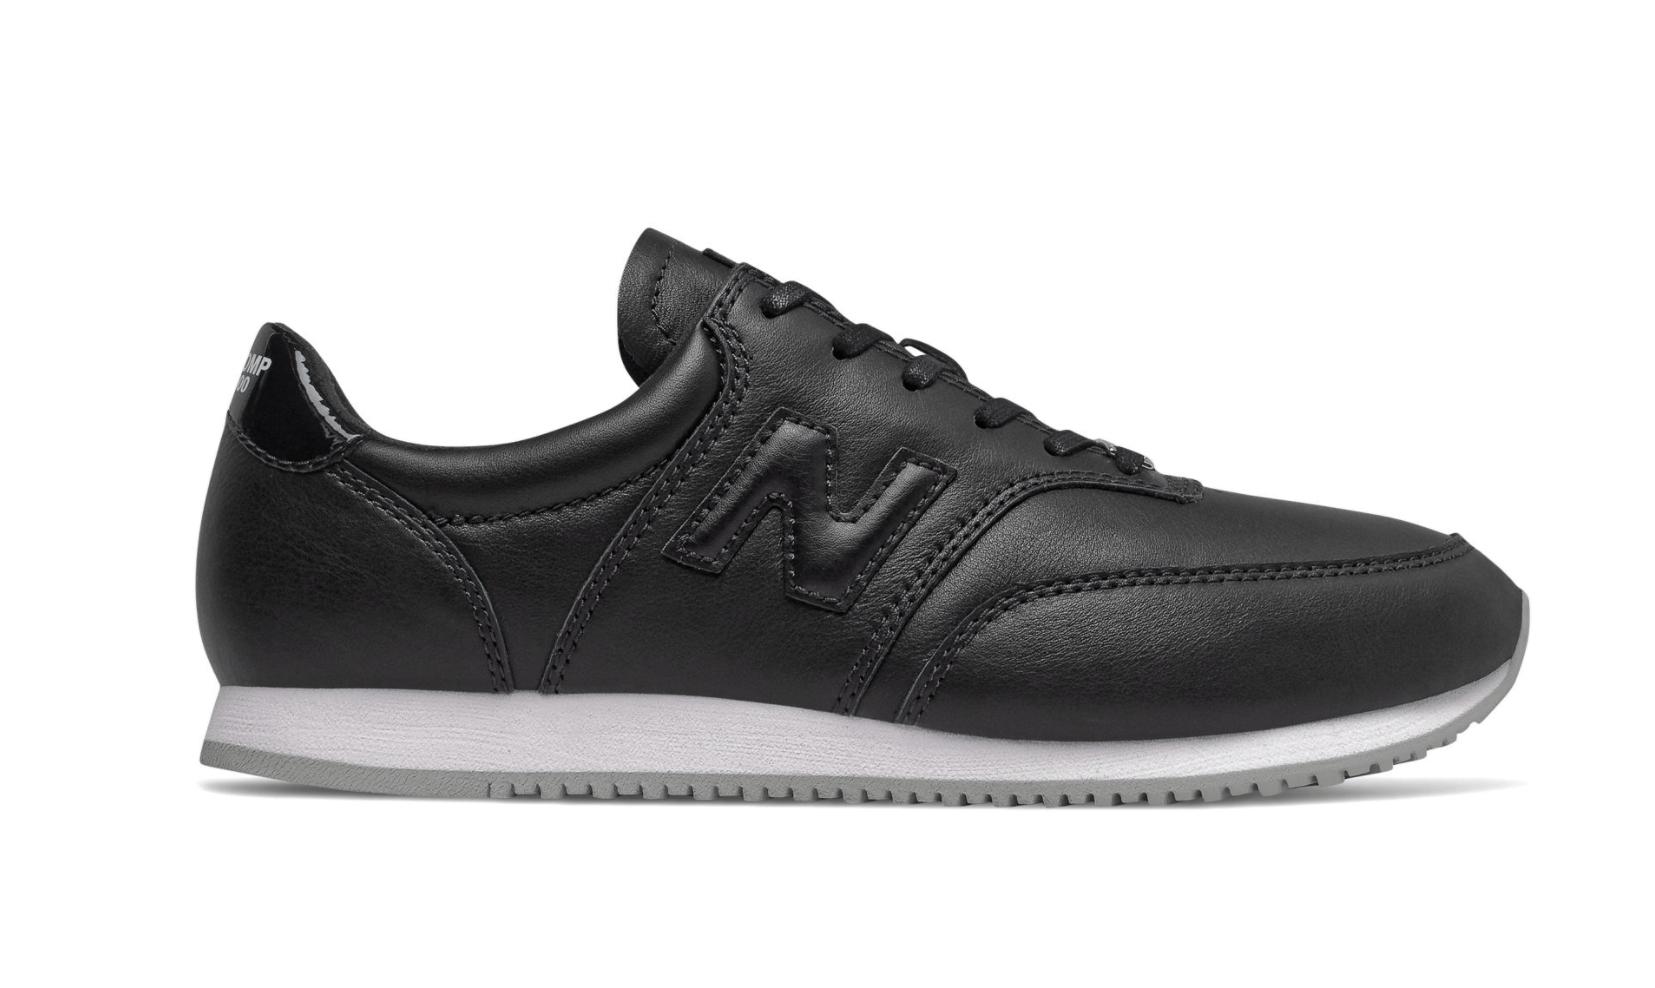 New Balance COMP 100 verano 2020 color negro